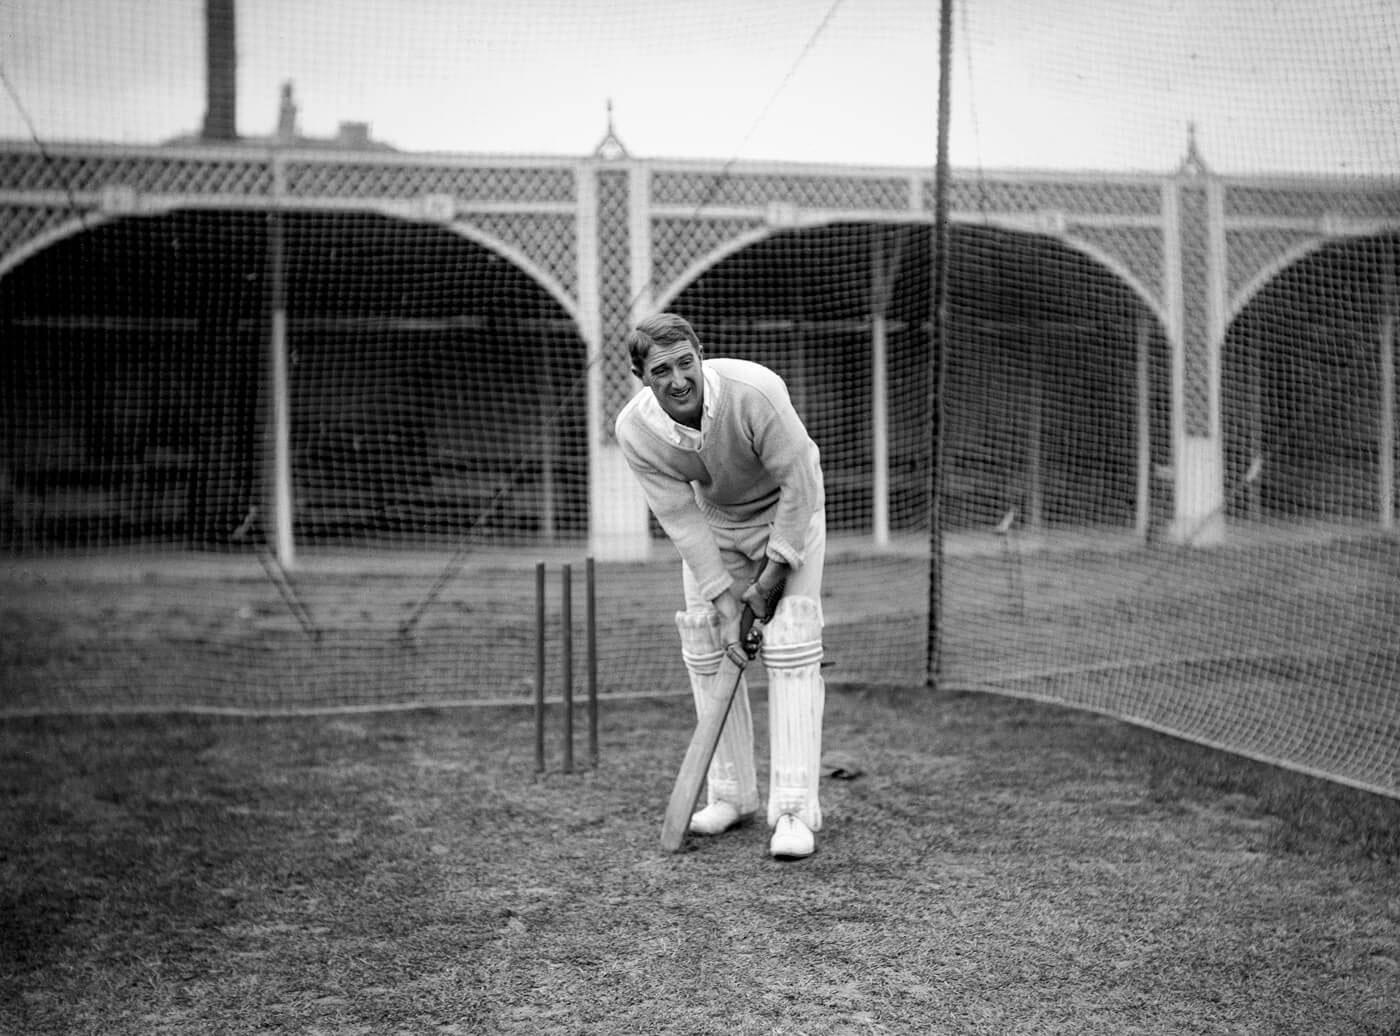 Aubrey Faulkner bats at the Lord's nets